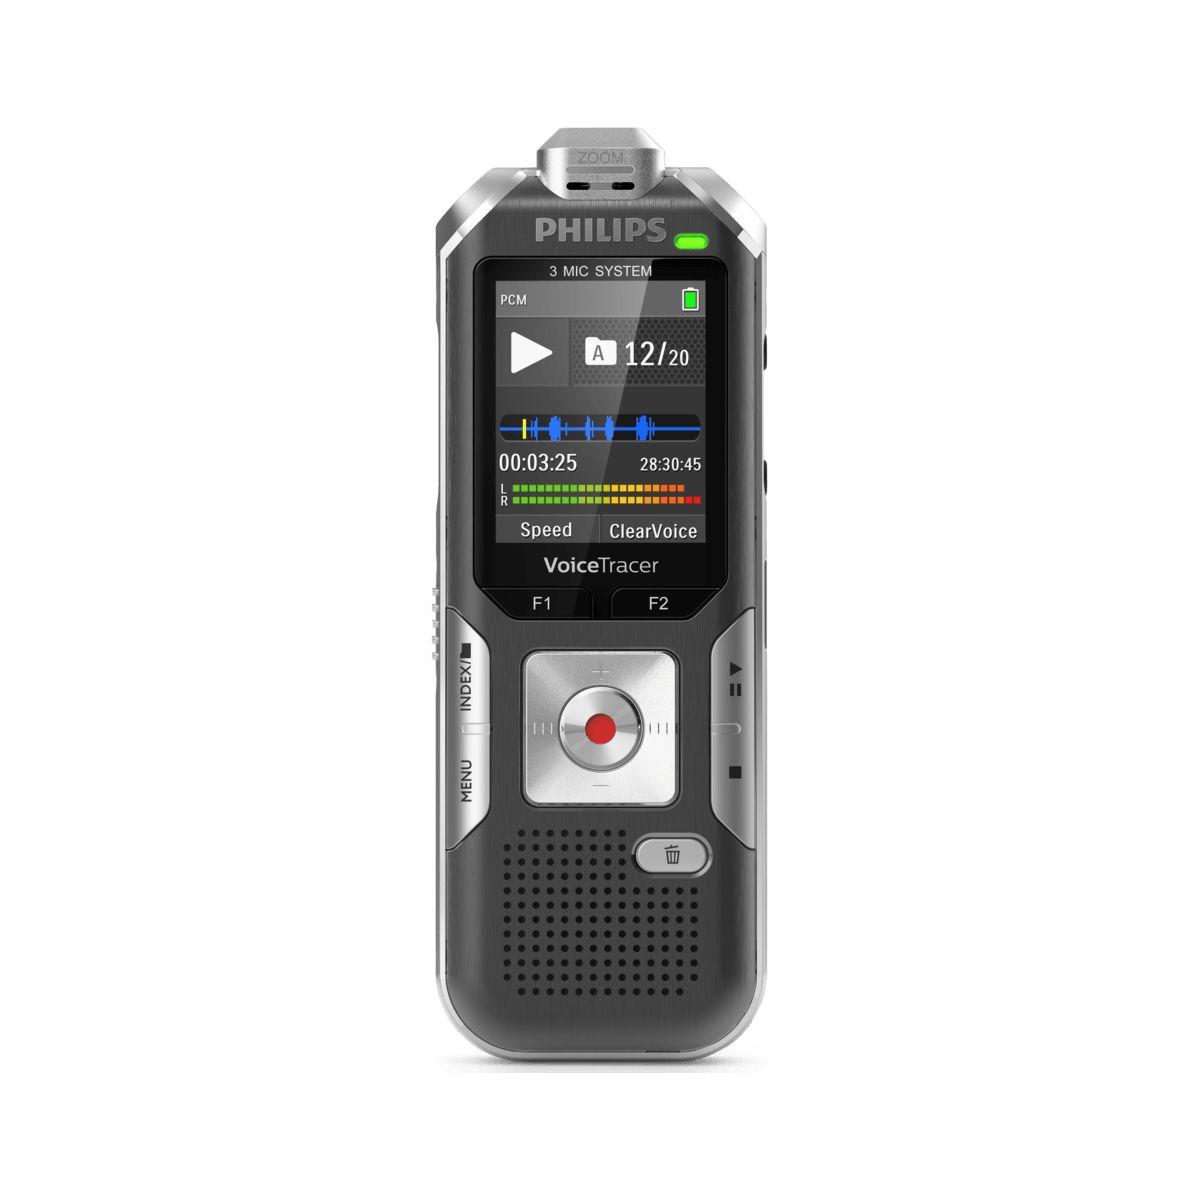 Dictaphone PHILIPS DVT6010/00 (photo)